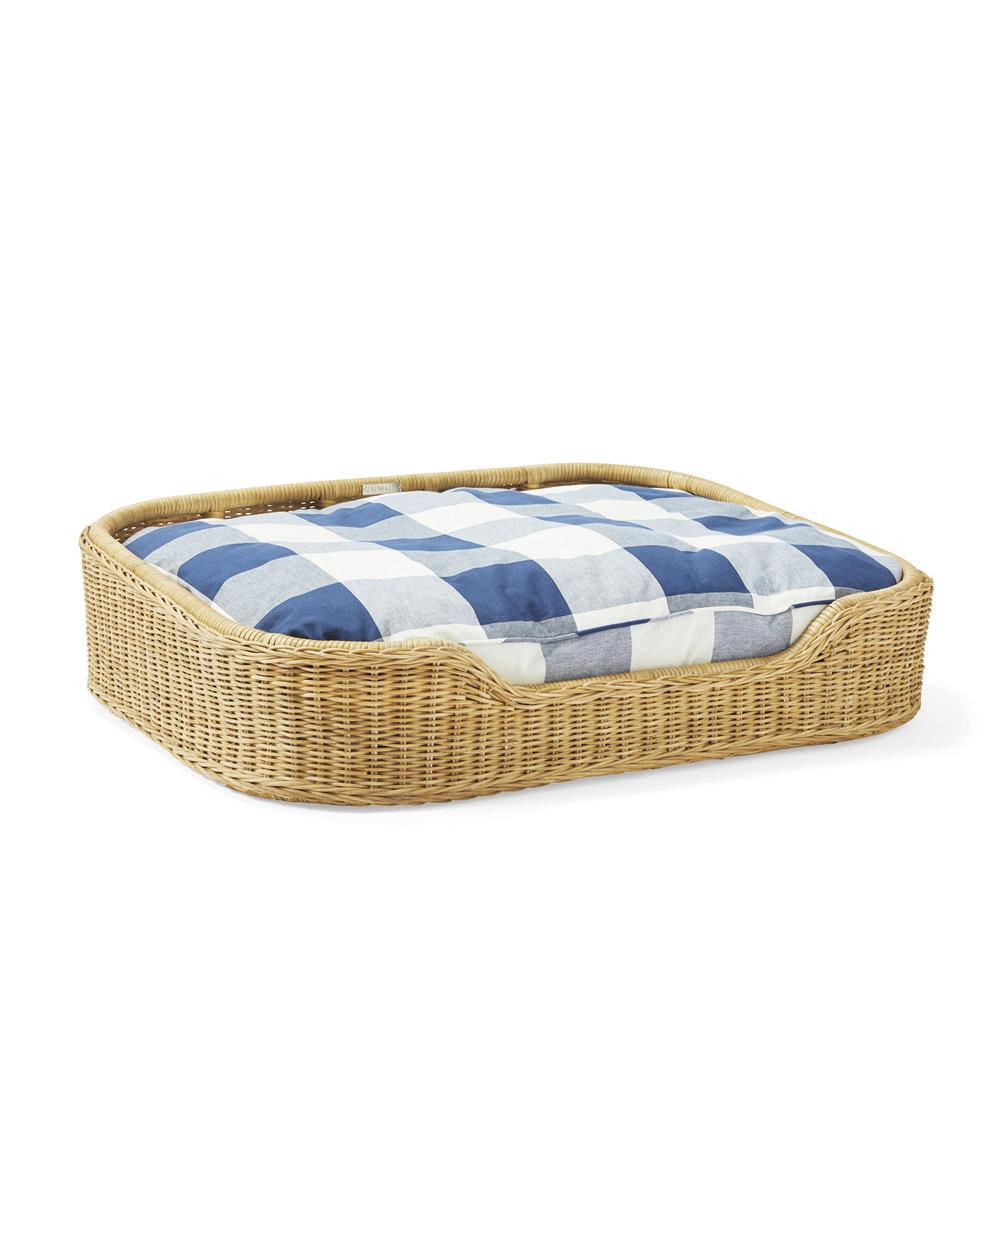 Furn_Natural_Dog_Bed_Large_Gingham_Cushion_Angle_MV_Crop_SH.jpg